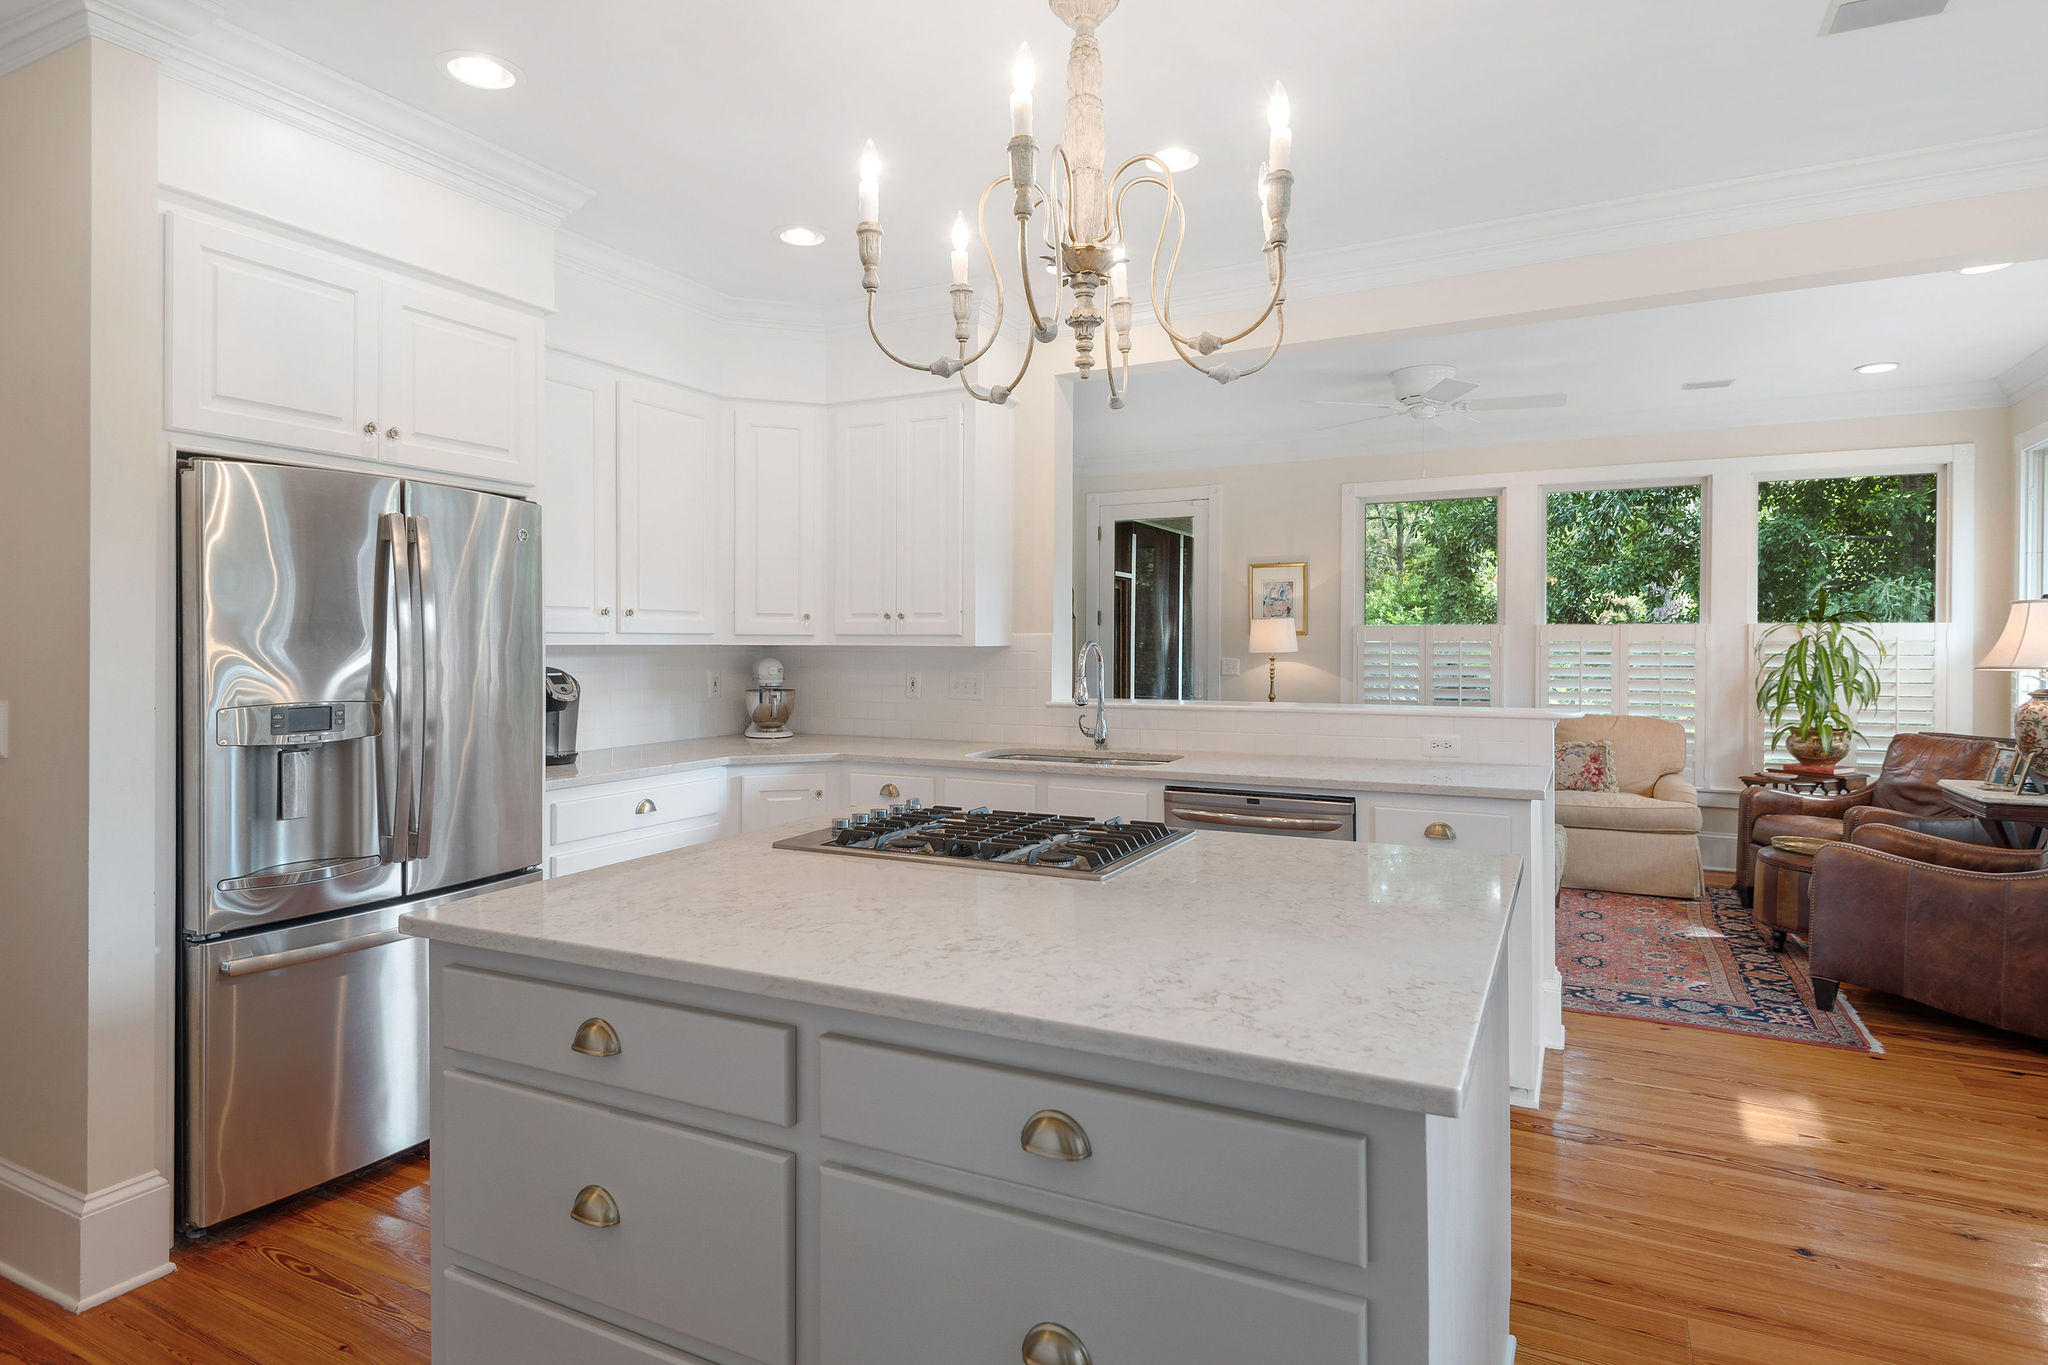 Country Club II Homes For Sale - 1482 Burningtree, Charleston, SC - 49